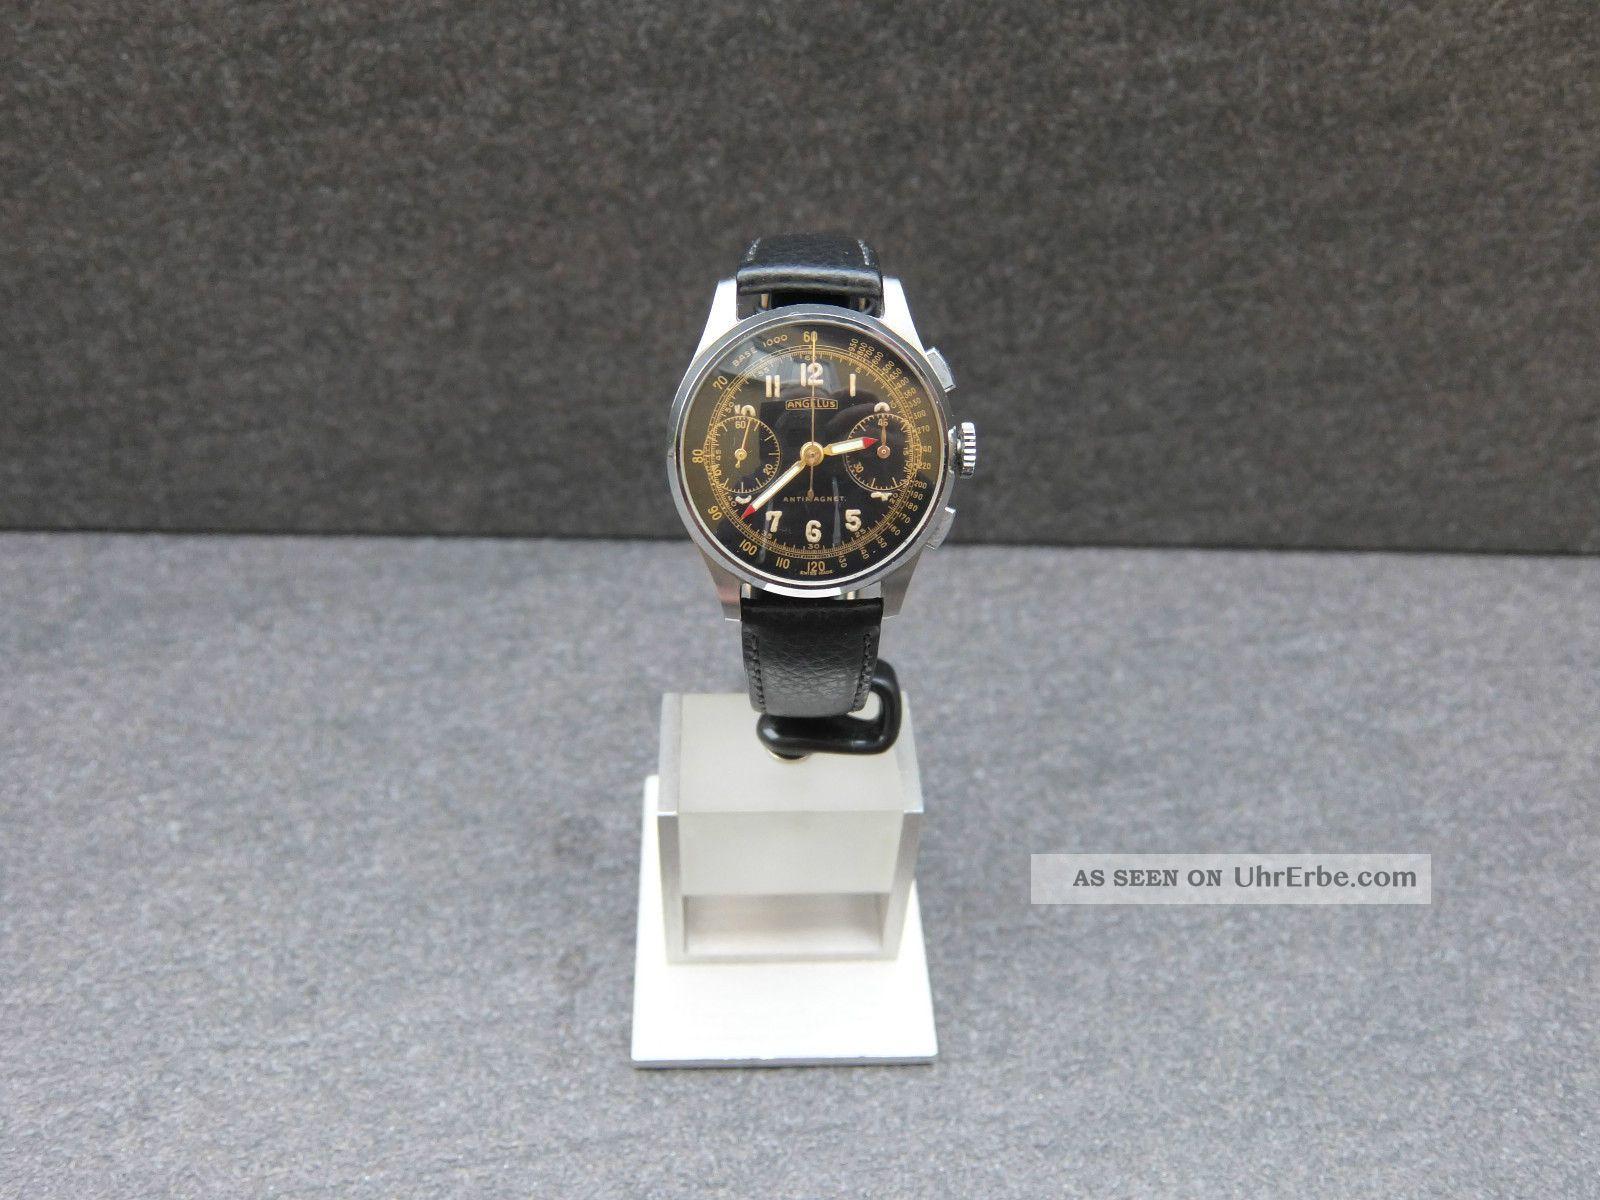 Angelus Chronograph Schwarzes Zifferblatt Kaliber Angelus 215 1940er Sammleruhr Armbanduhren Bild